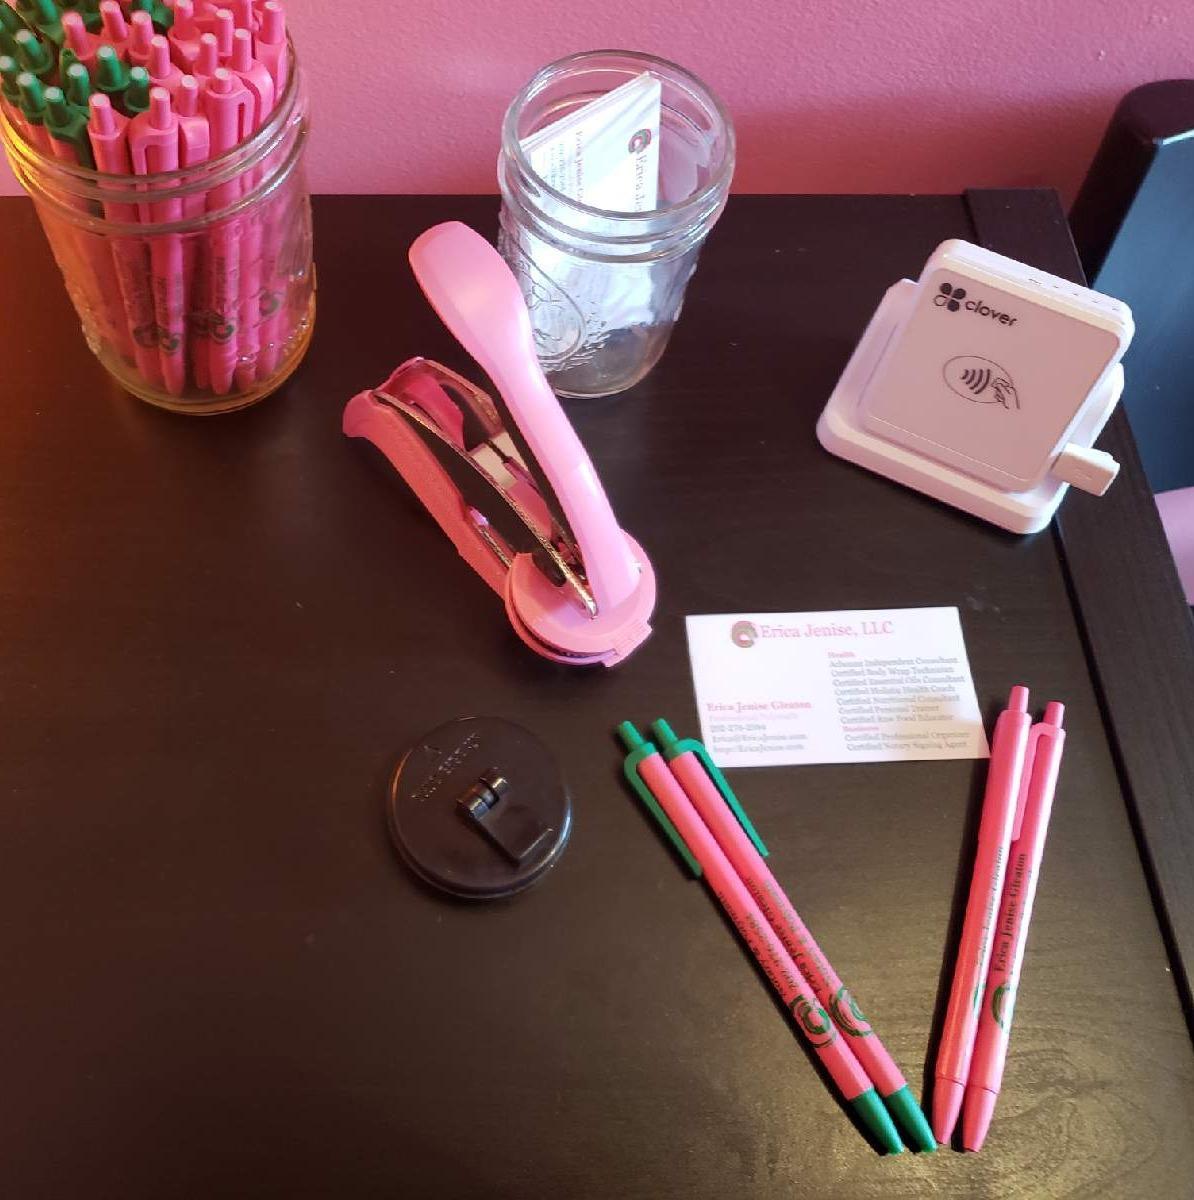 💖💚 Pretty Pink Mobile Notary & Polymath | Erica Jenise, LLC 💚💖 image 1